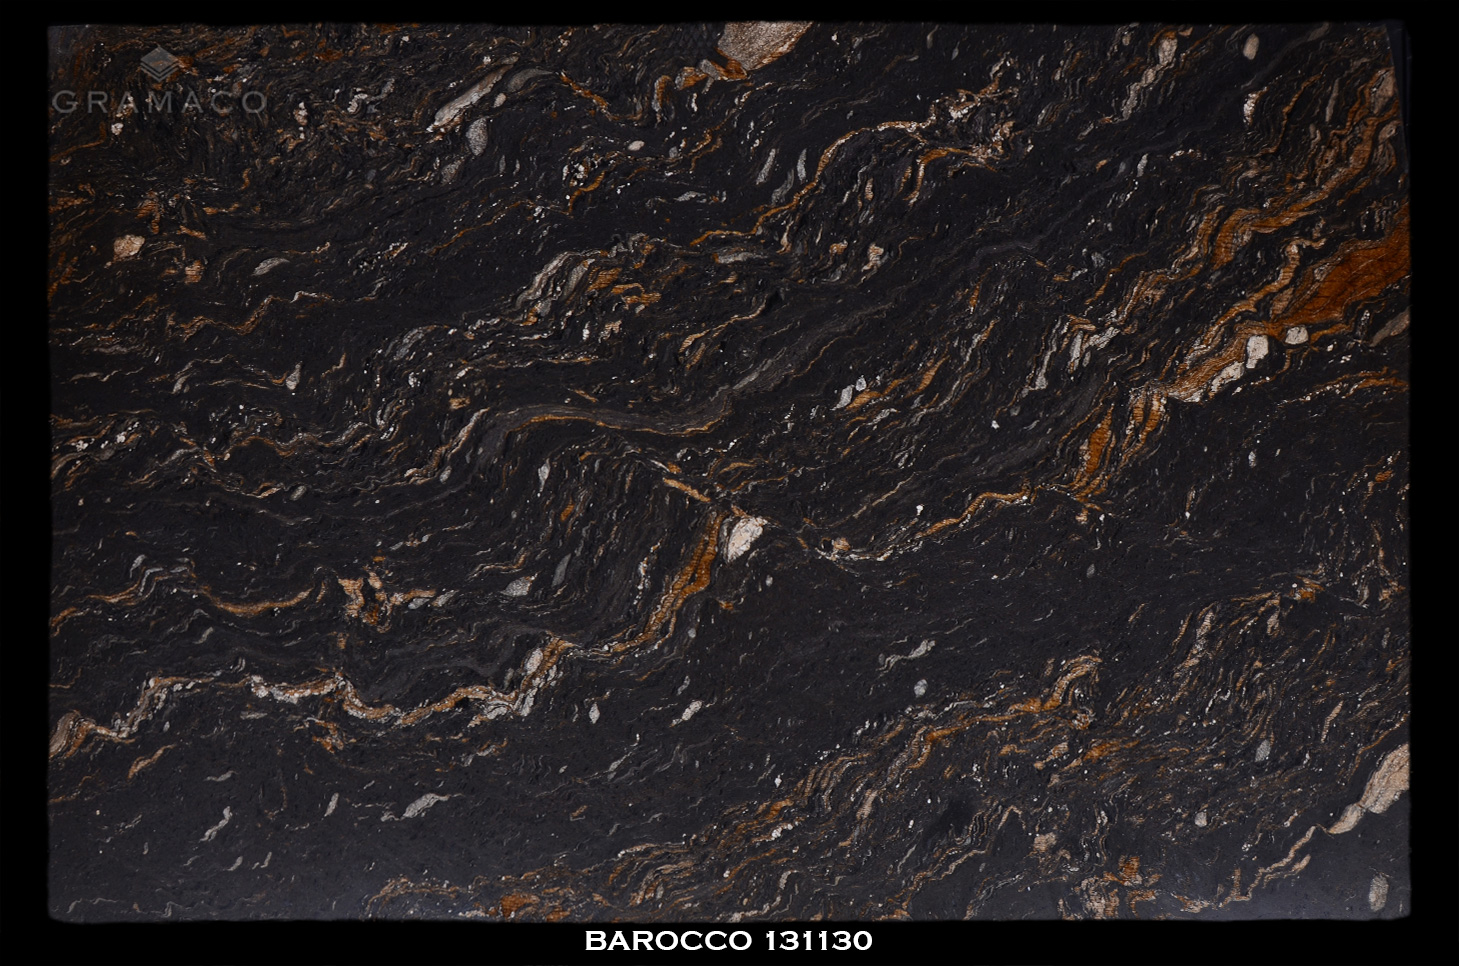 barocco131130-slab